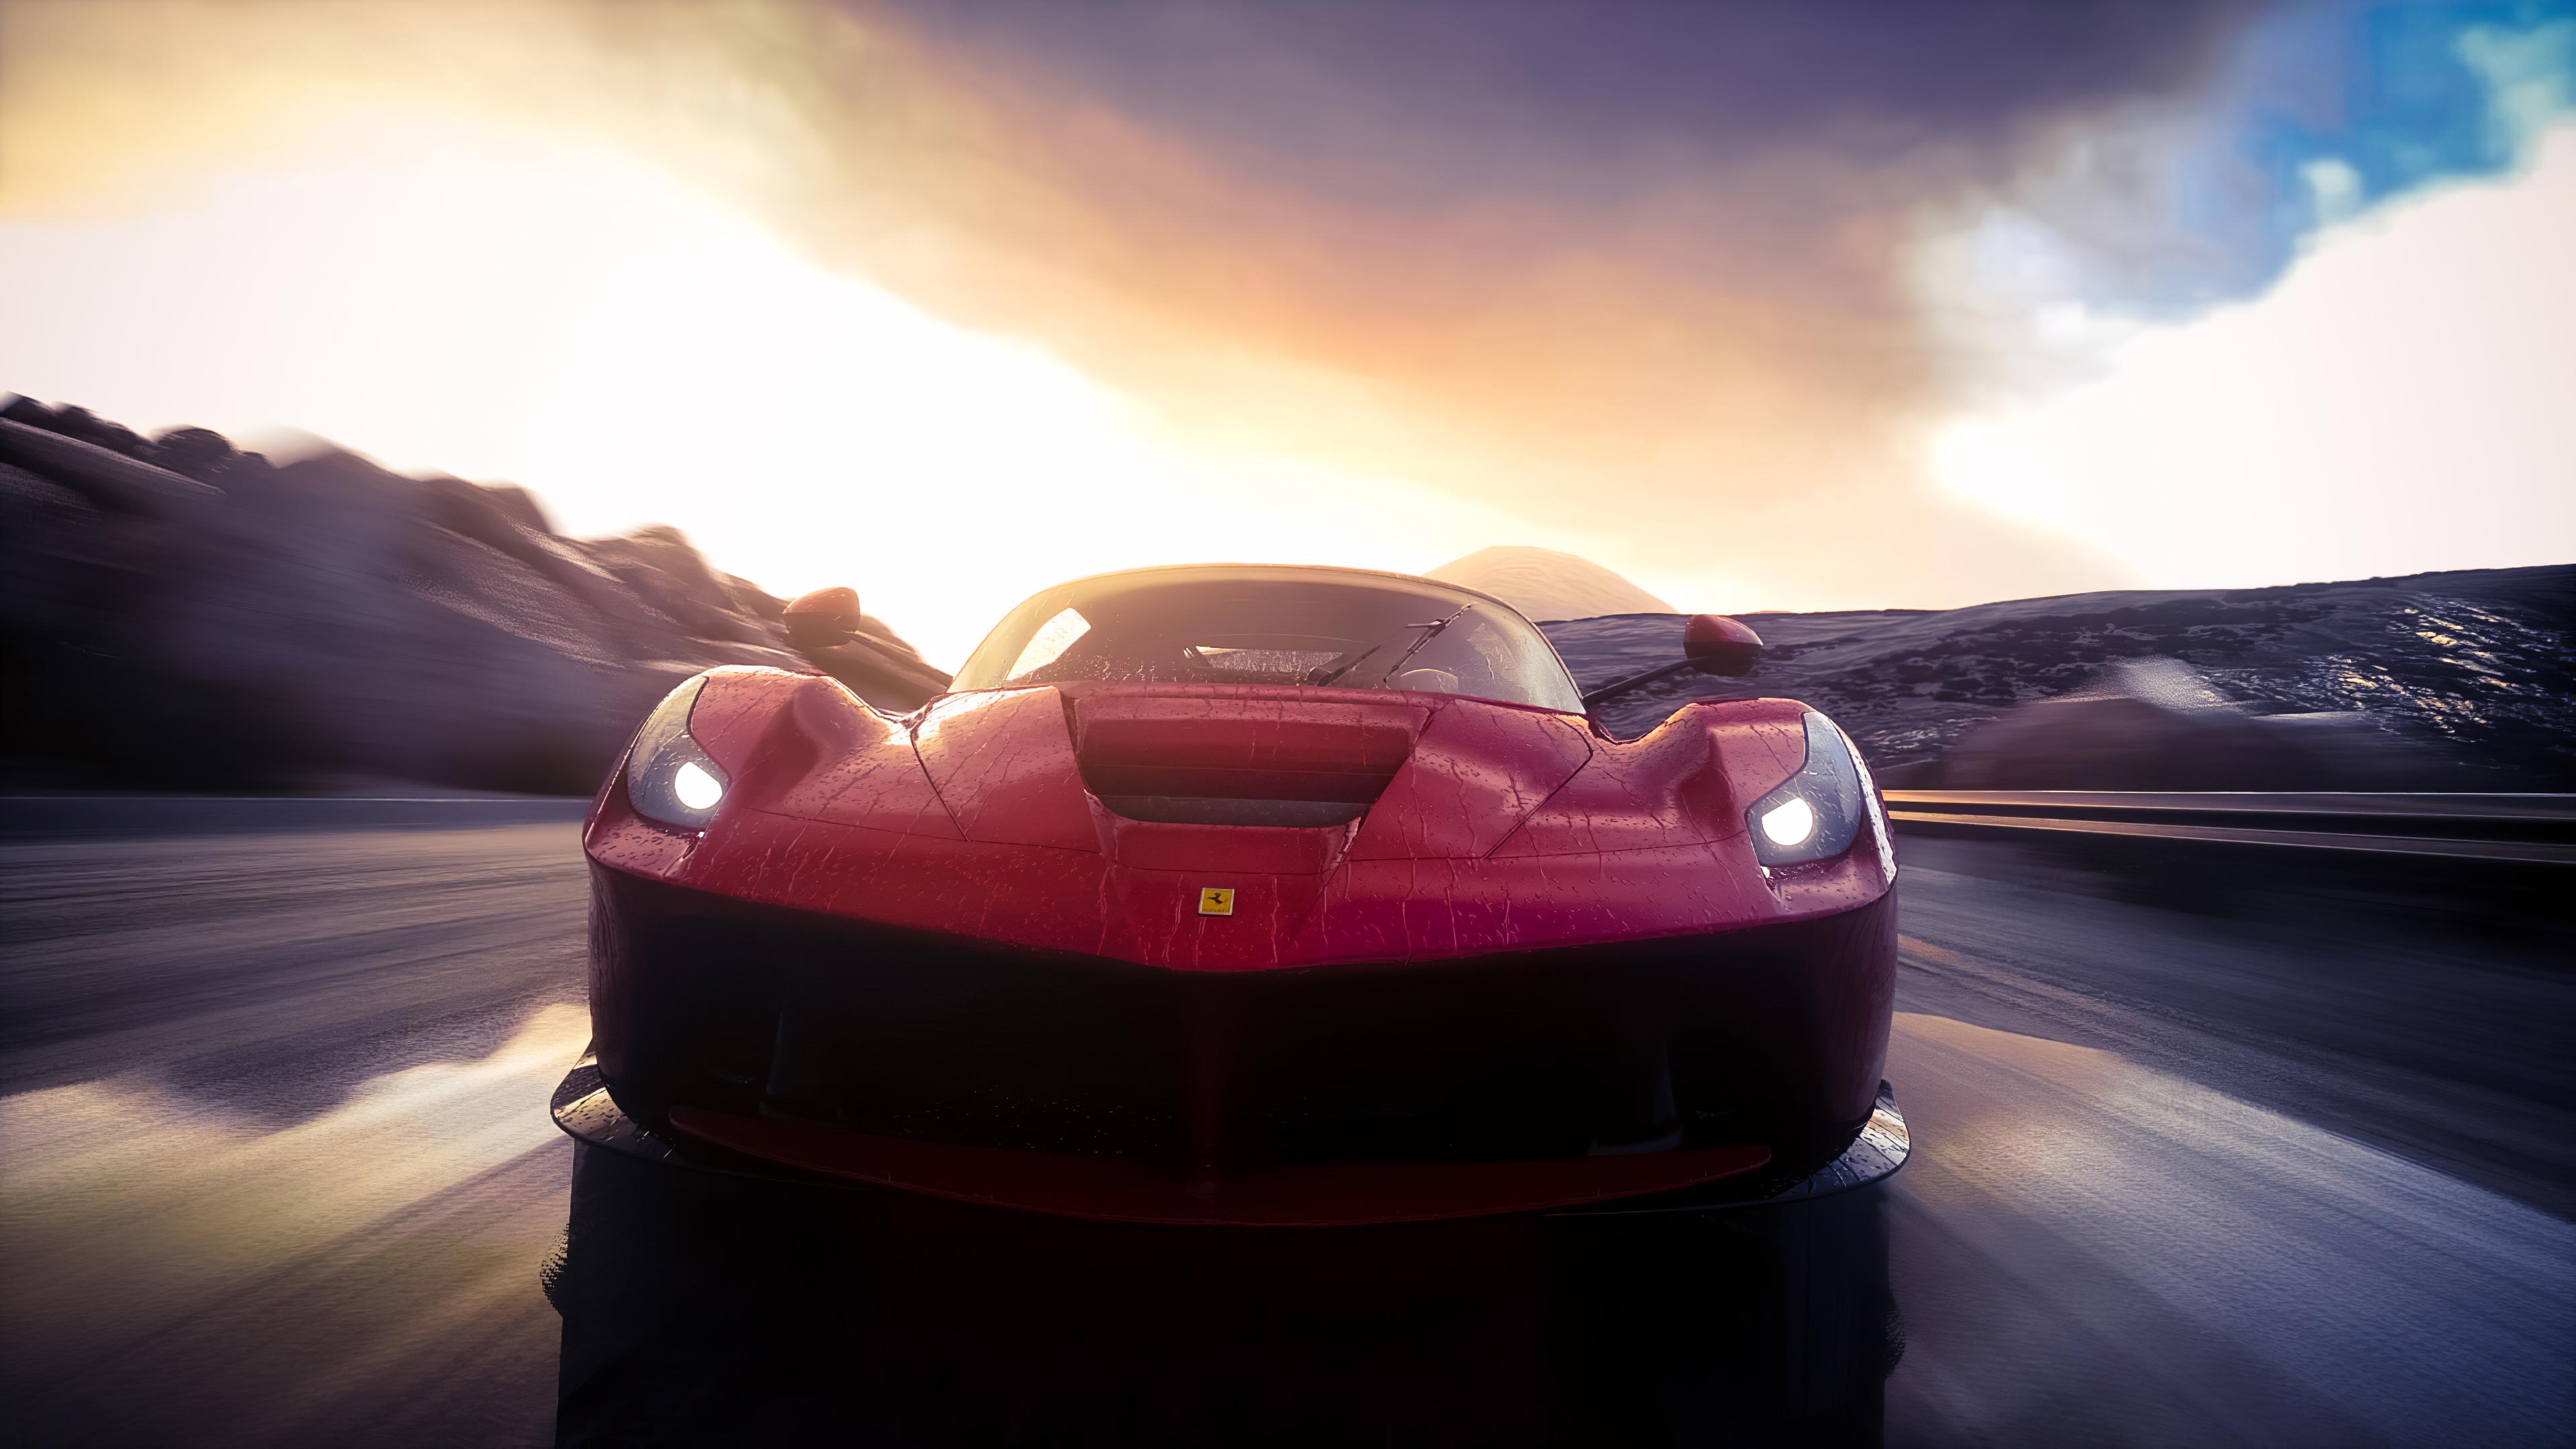 driverclub ferrari laferrari 1578851387 - Driverclub Ferrari Laferrari - Driverclub Ferrari Laferrari 4k wallpaper